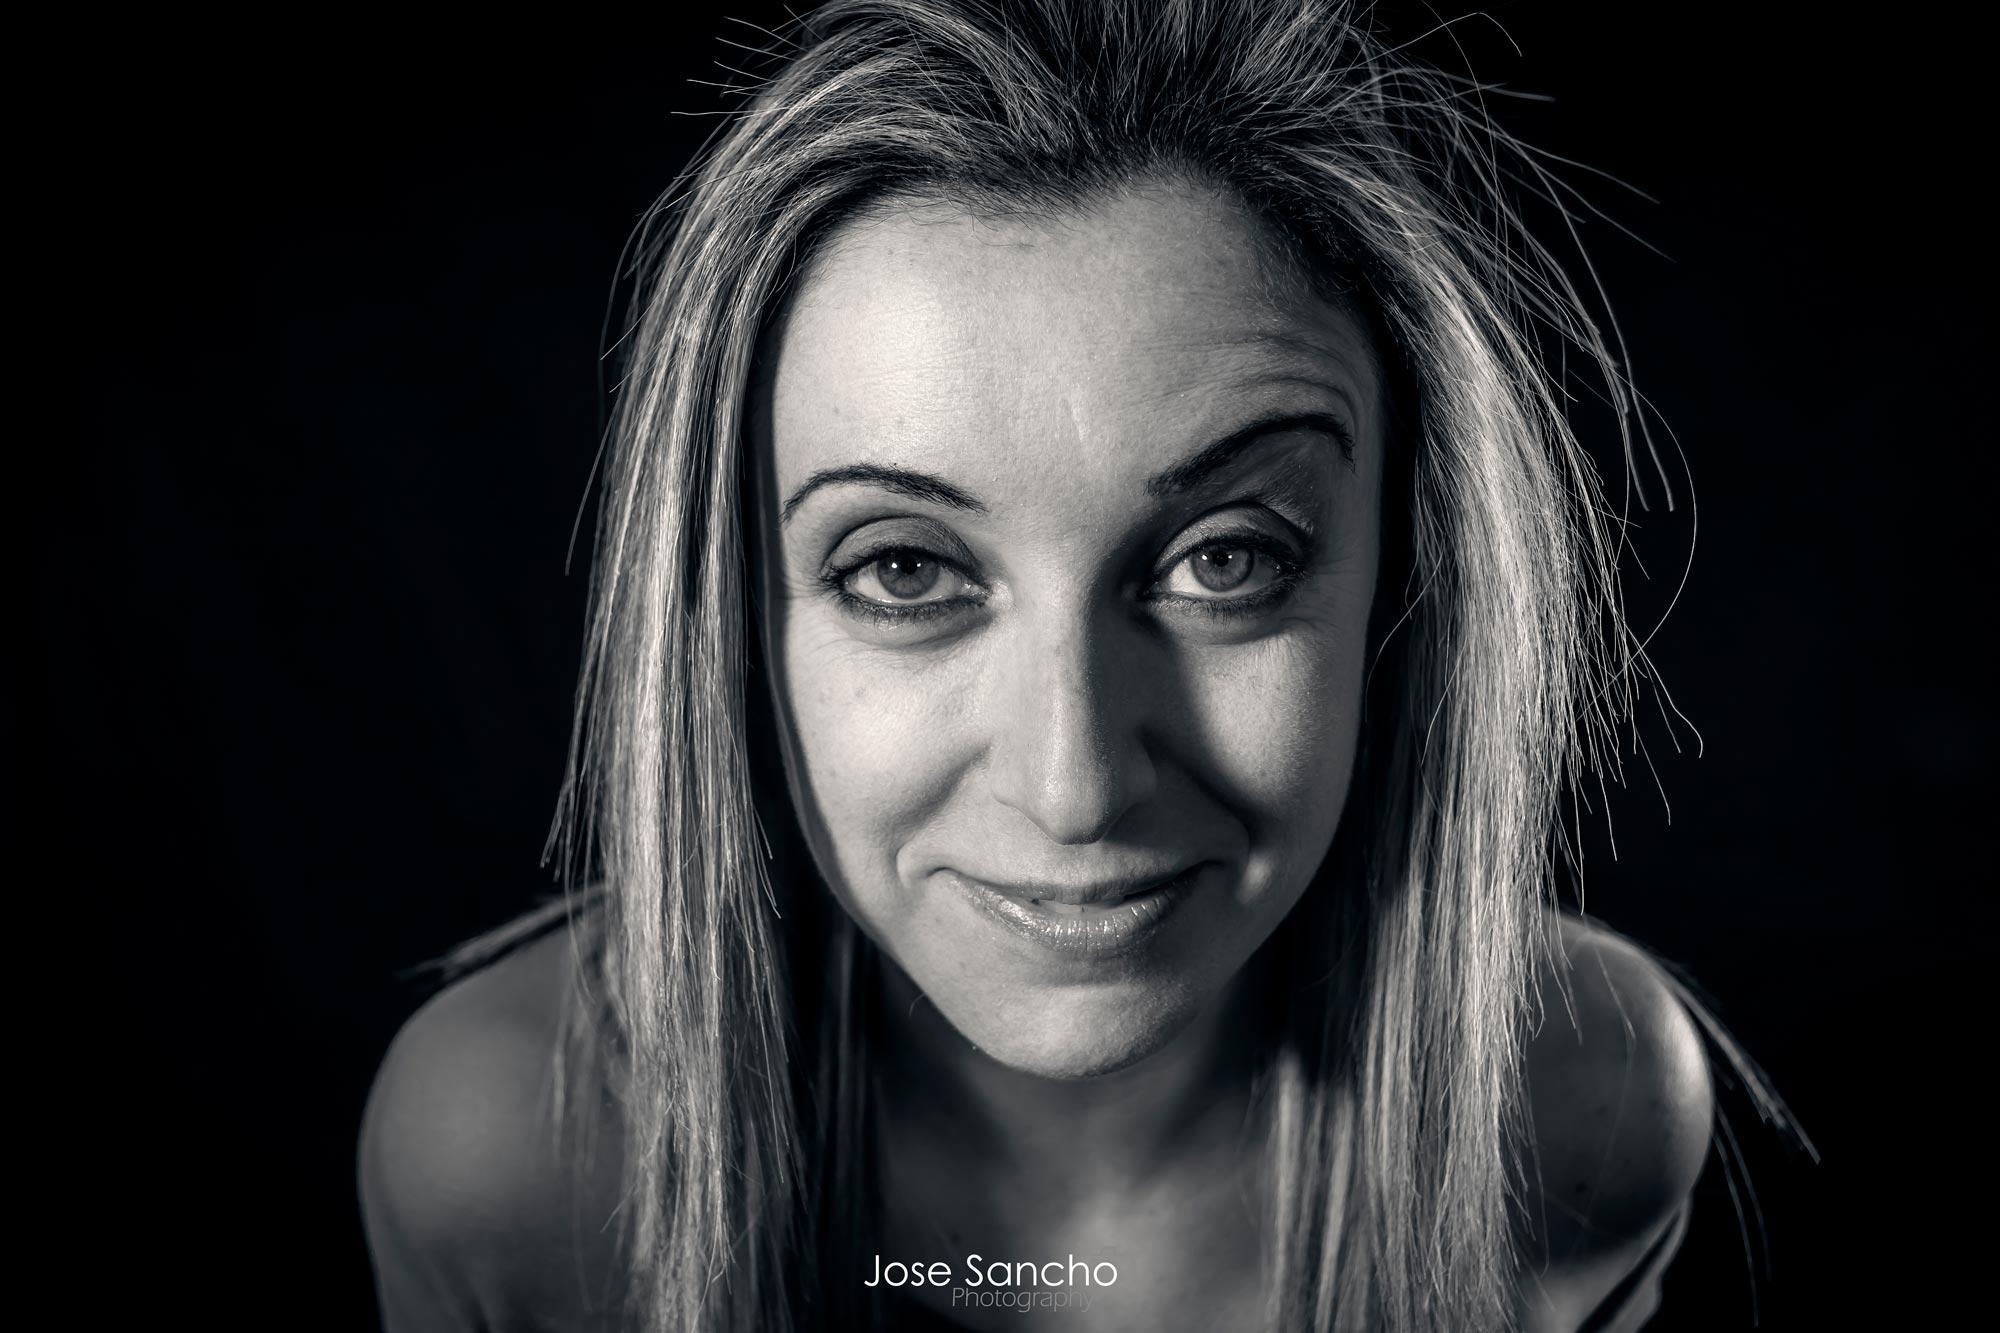 Mayte - Jose Sancho Photography